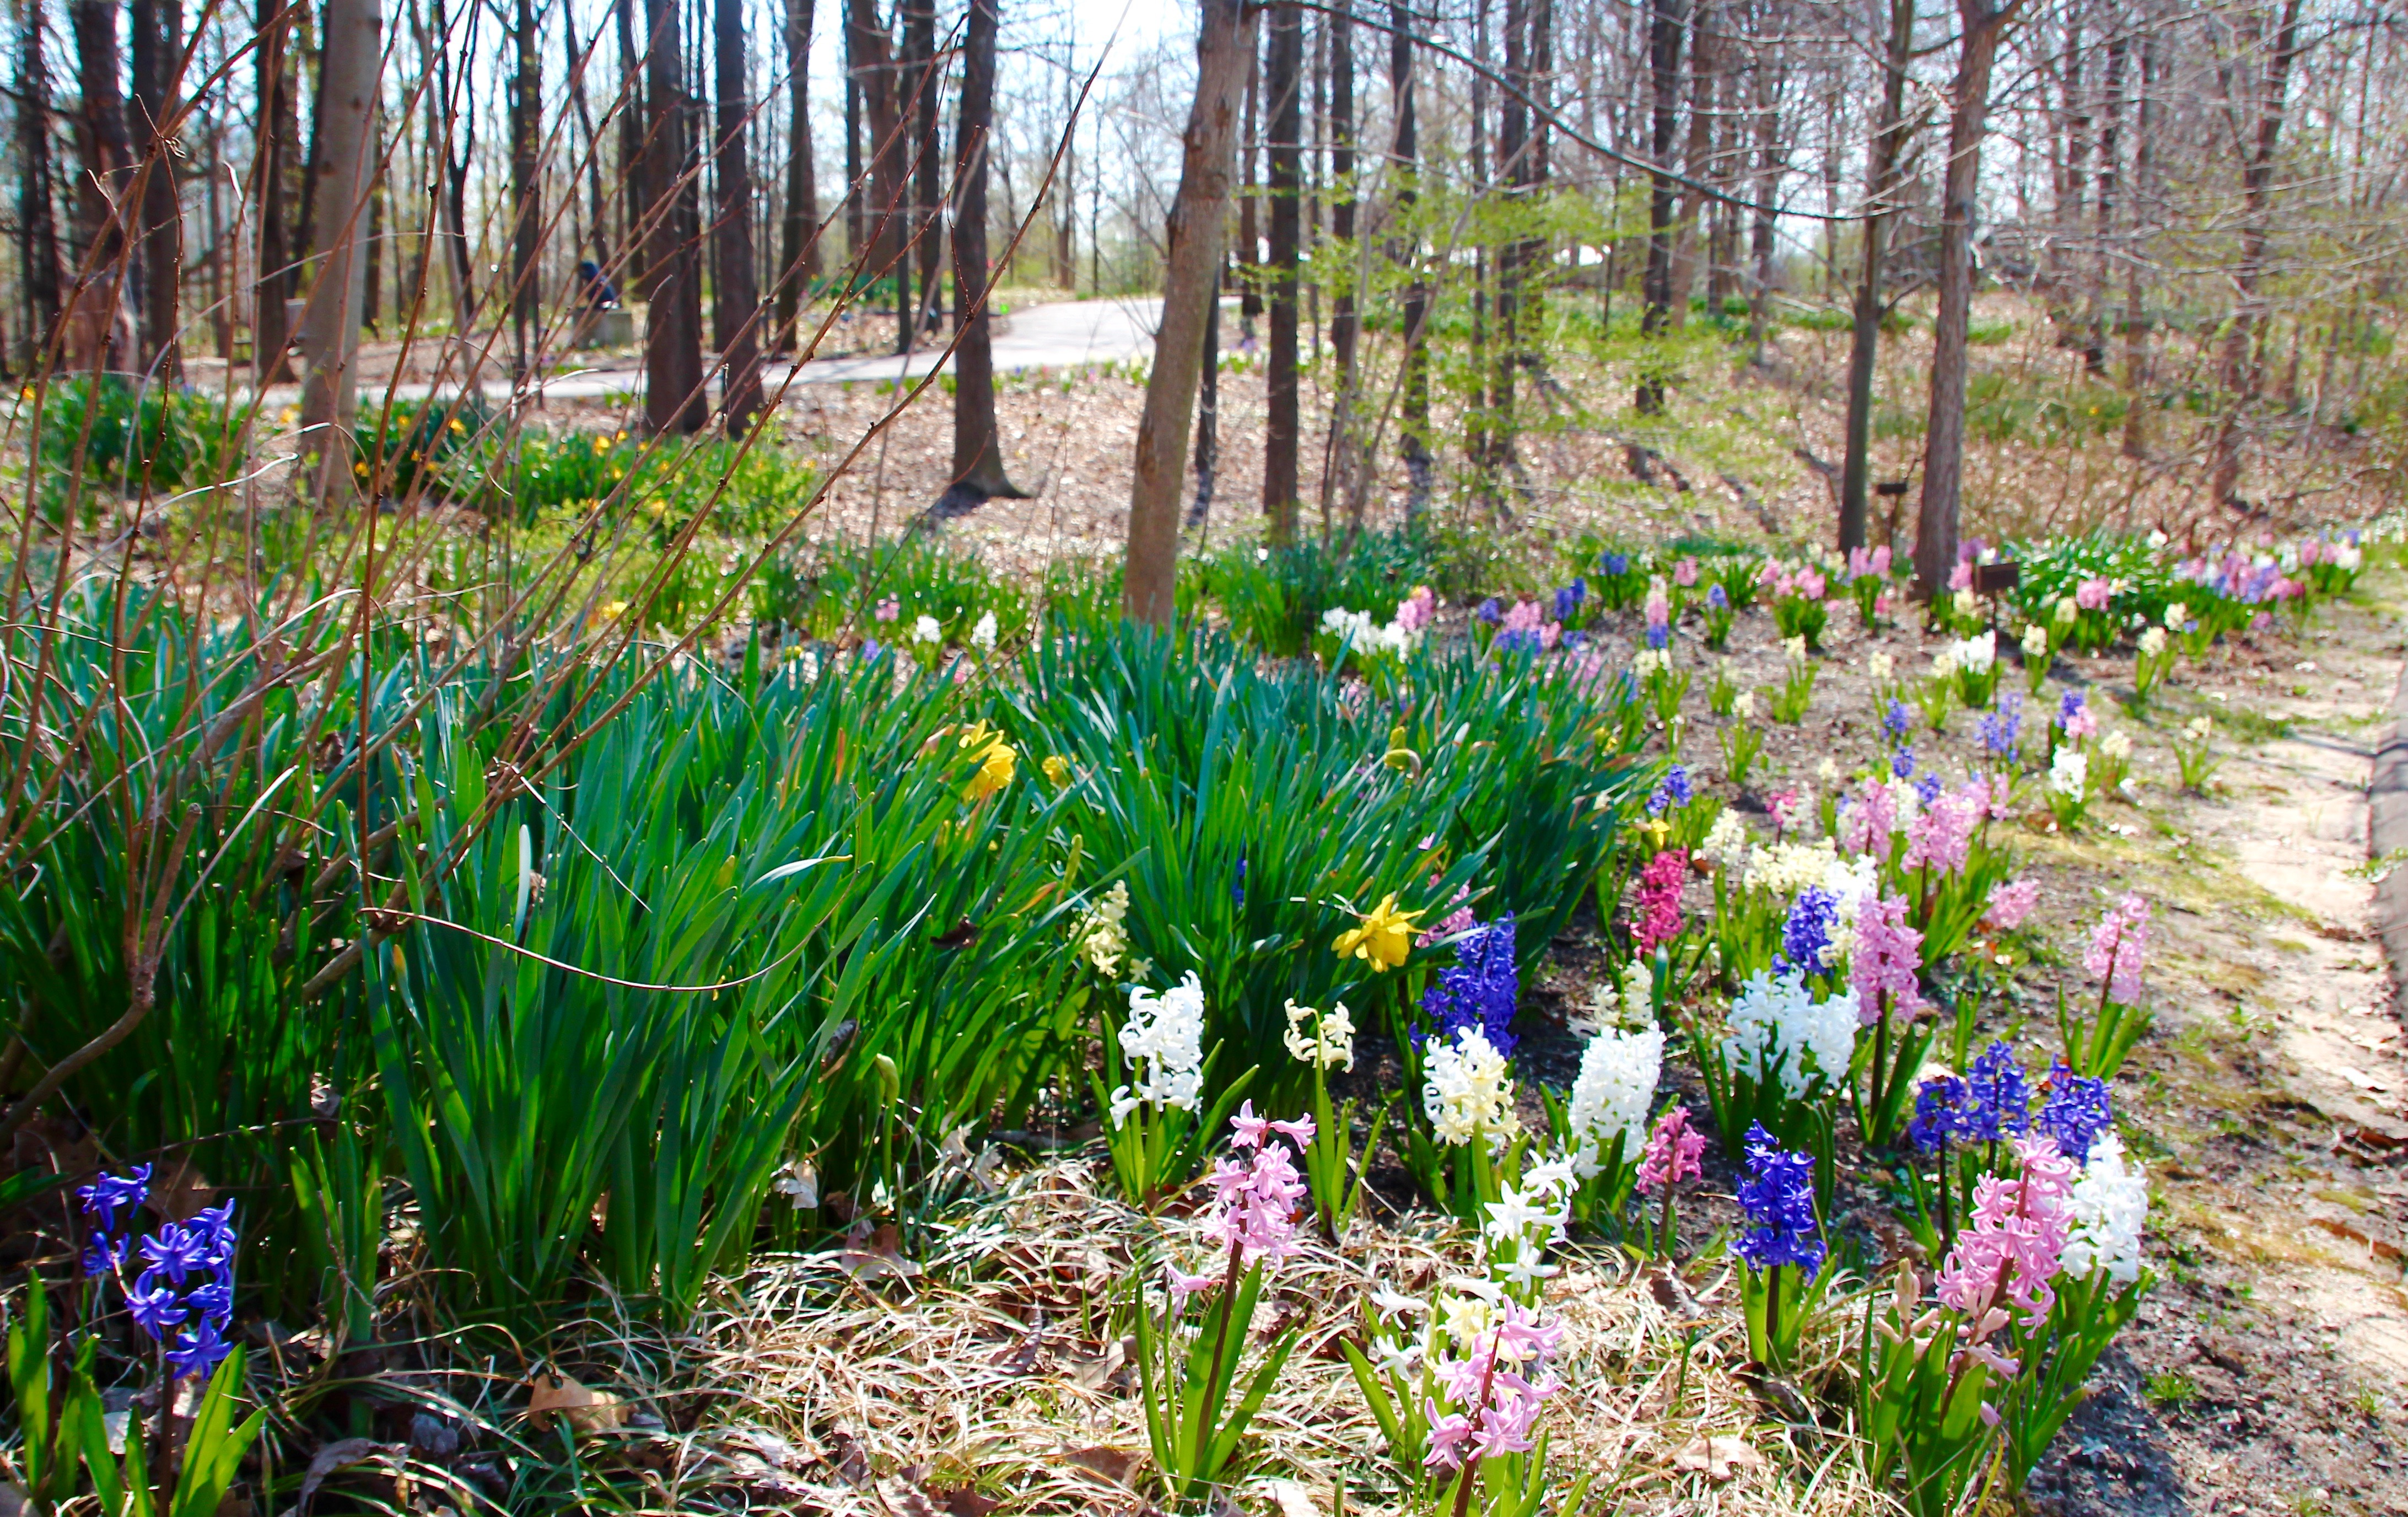 Woodland Path Decked With Spring Flowers At Meijer Garden Summer